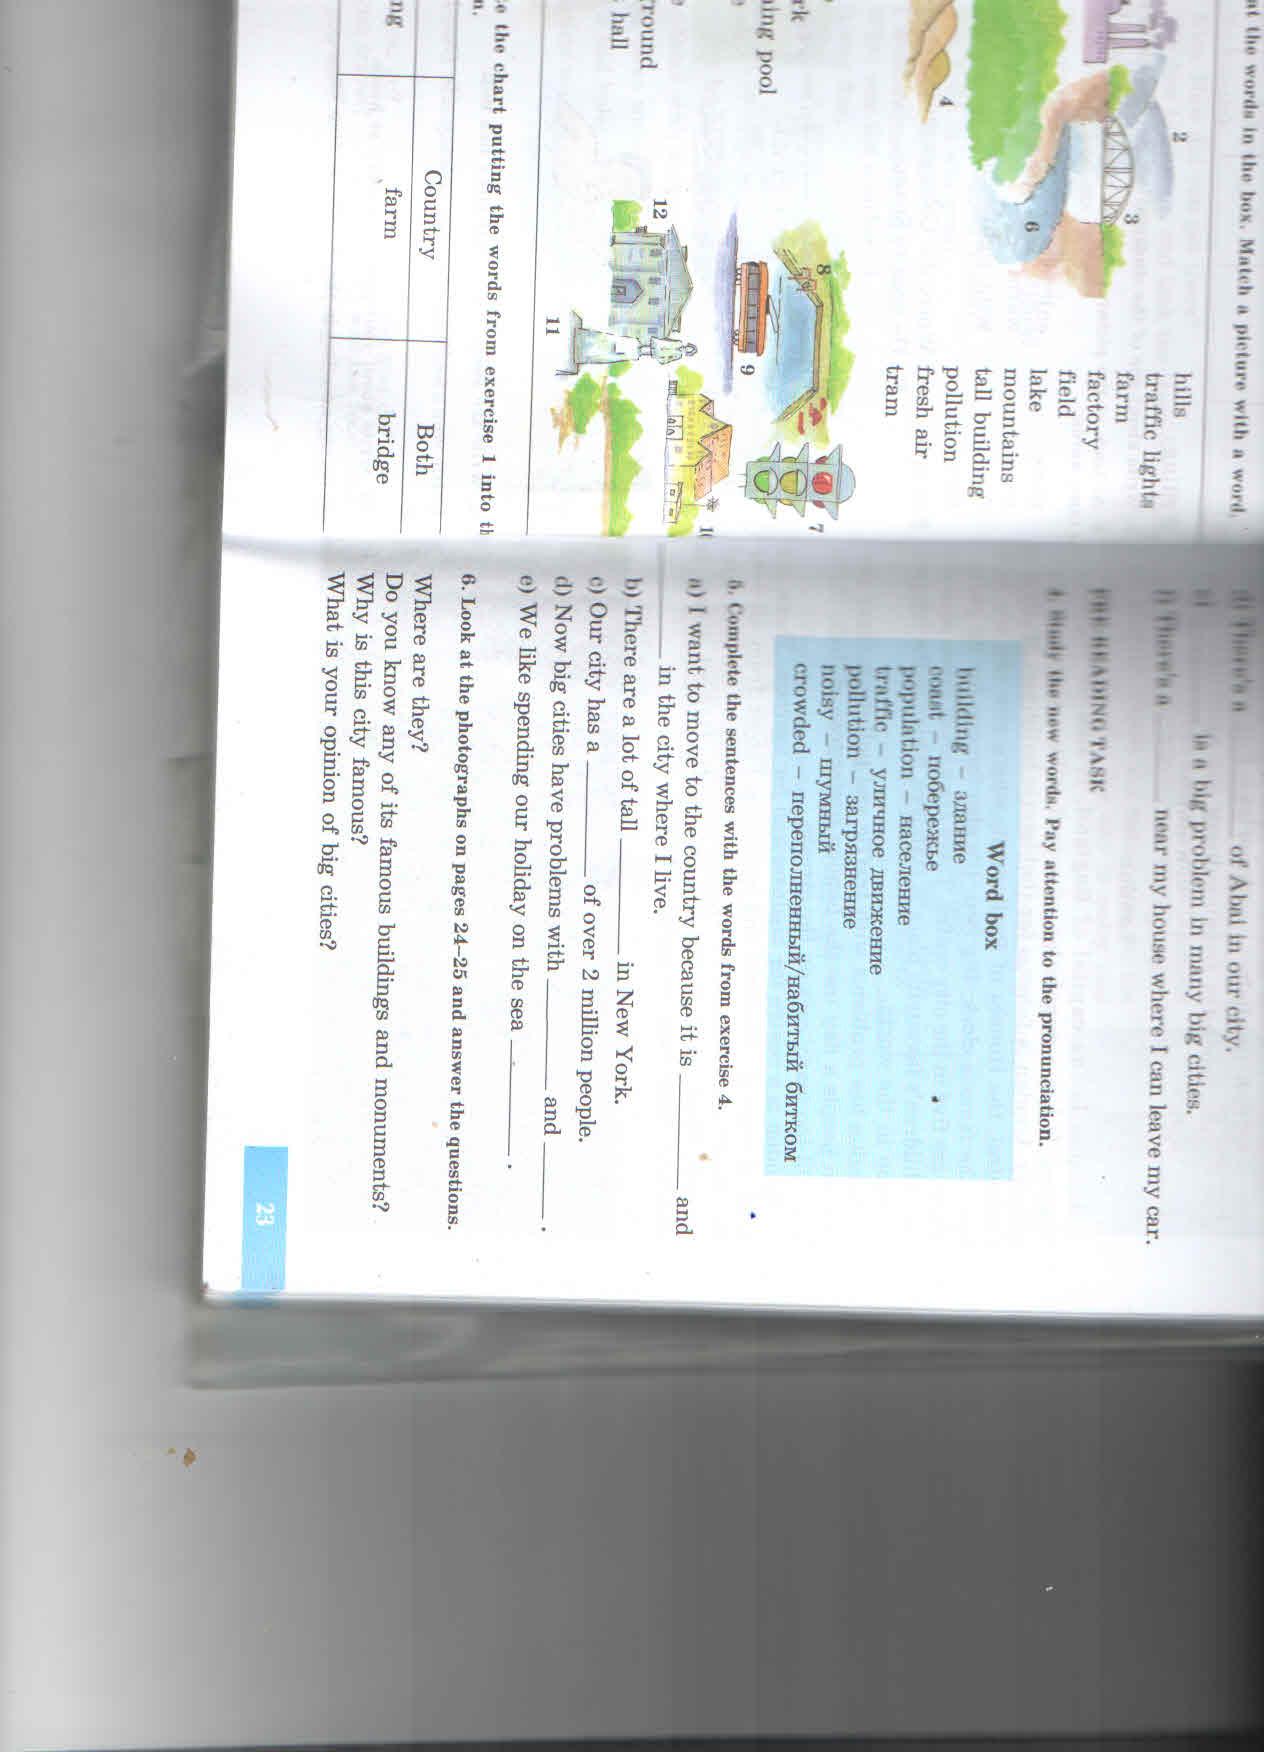 учебник английского языка за 10 класс аяпова